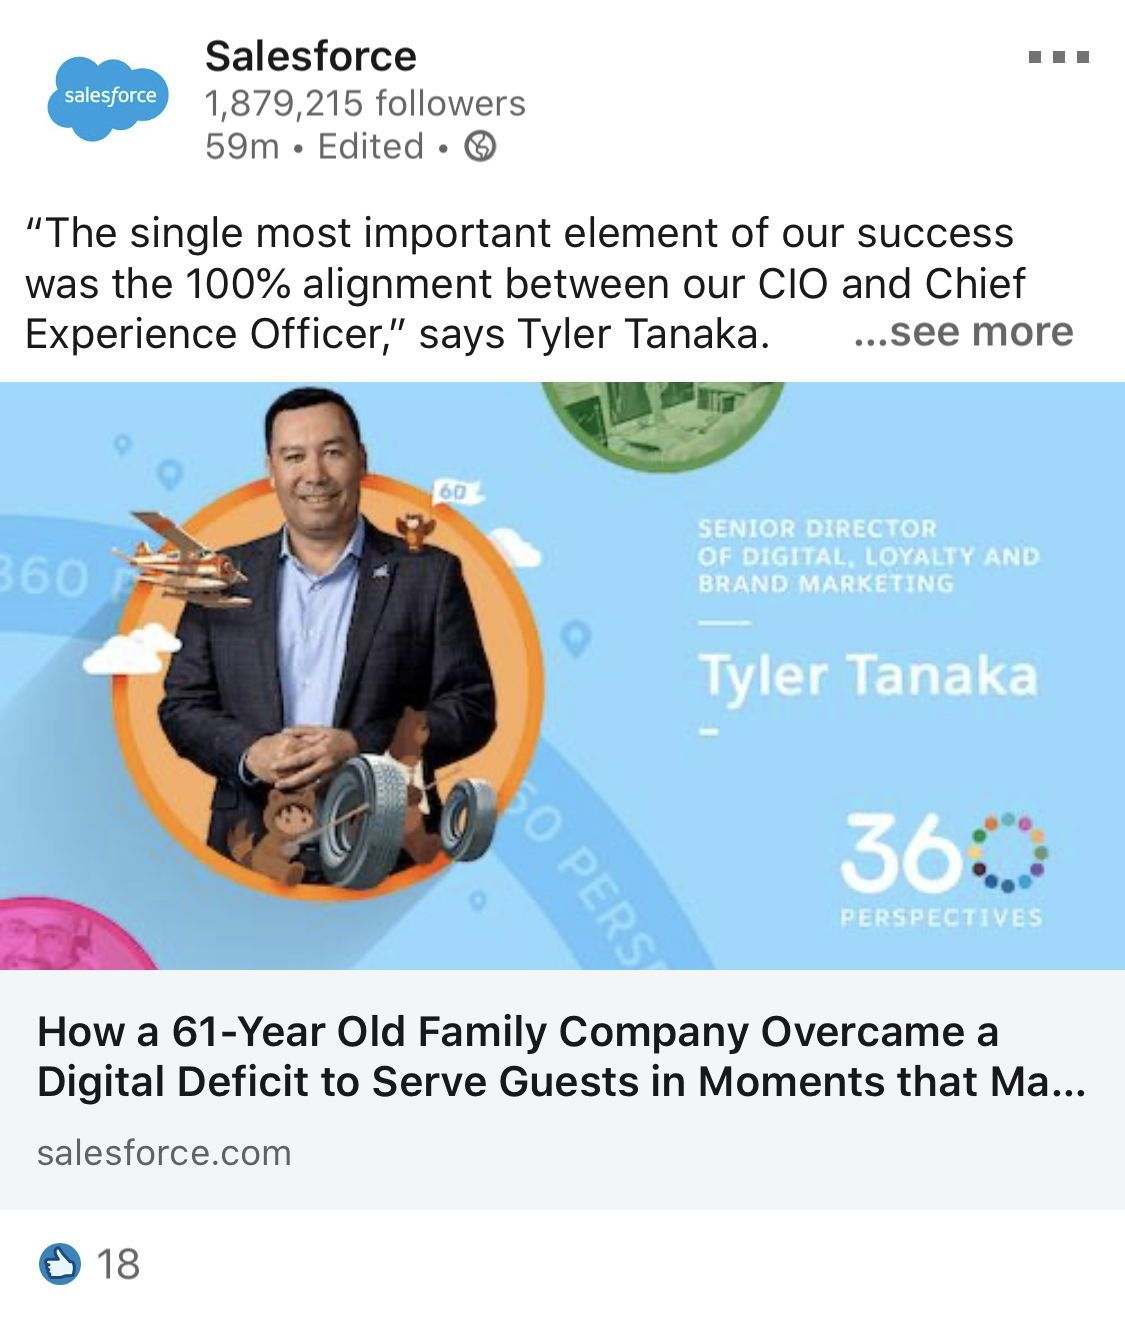 Creative Employee Spotlight Post Examples on LinkedIn in